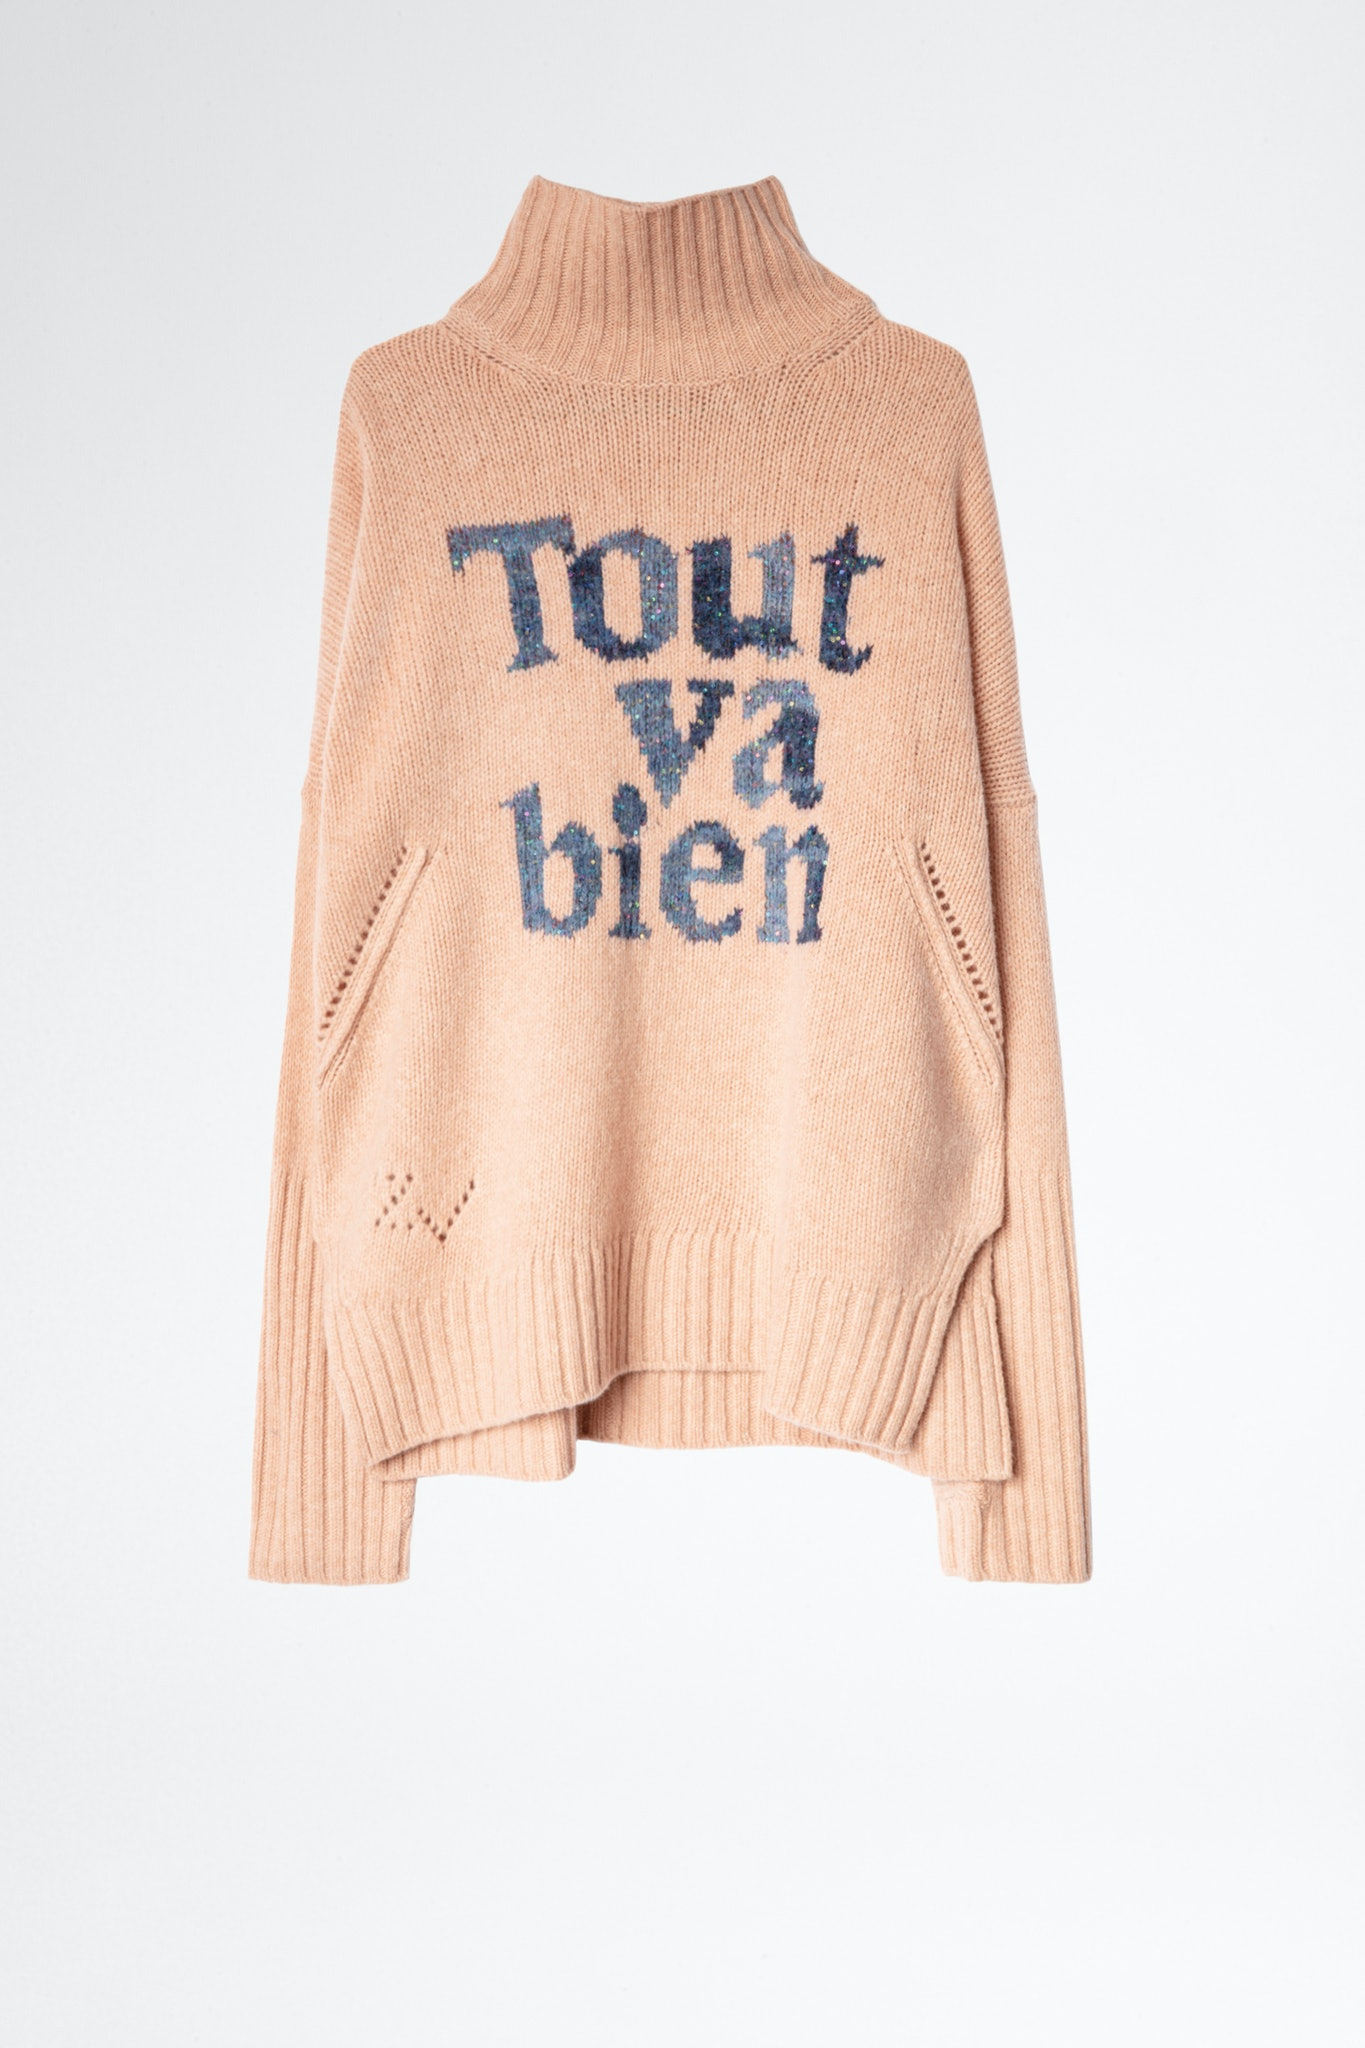 Alma Tout Va Bien Sweater